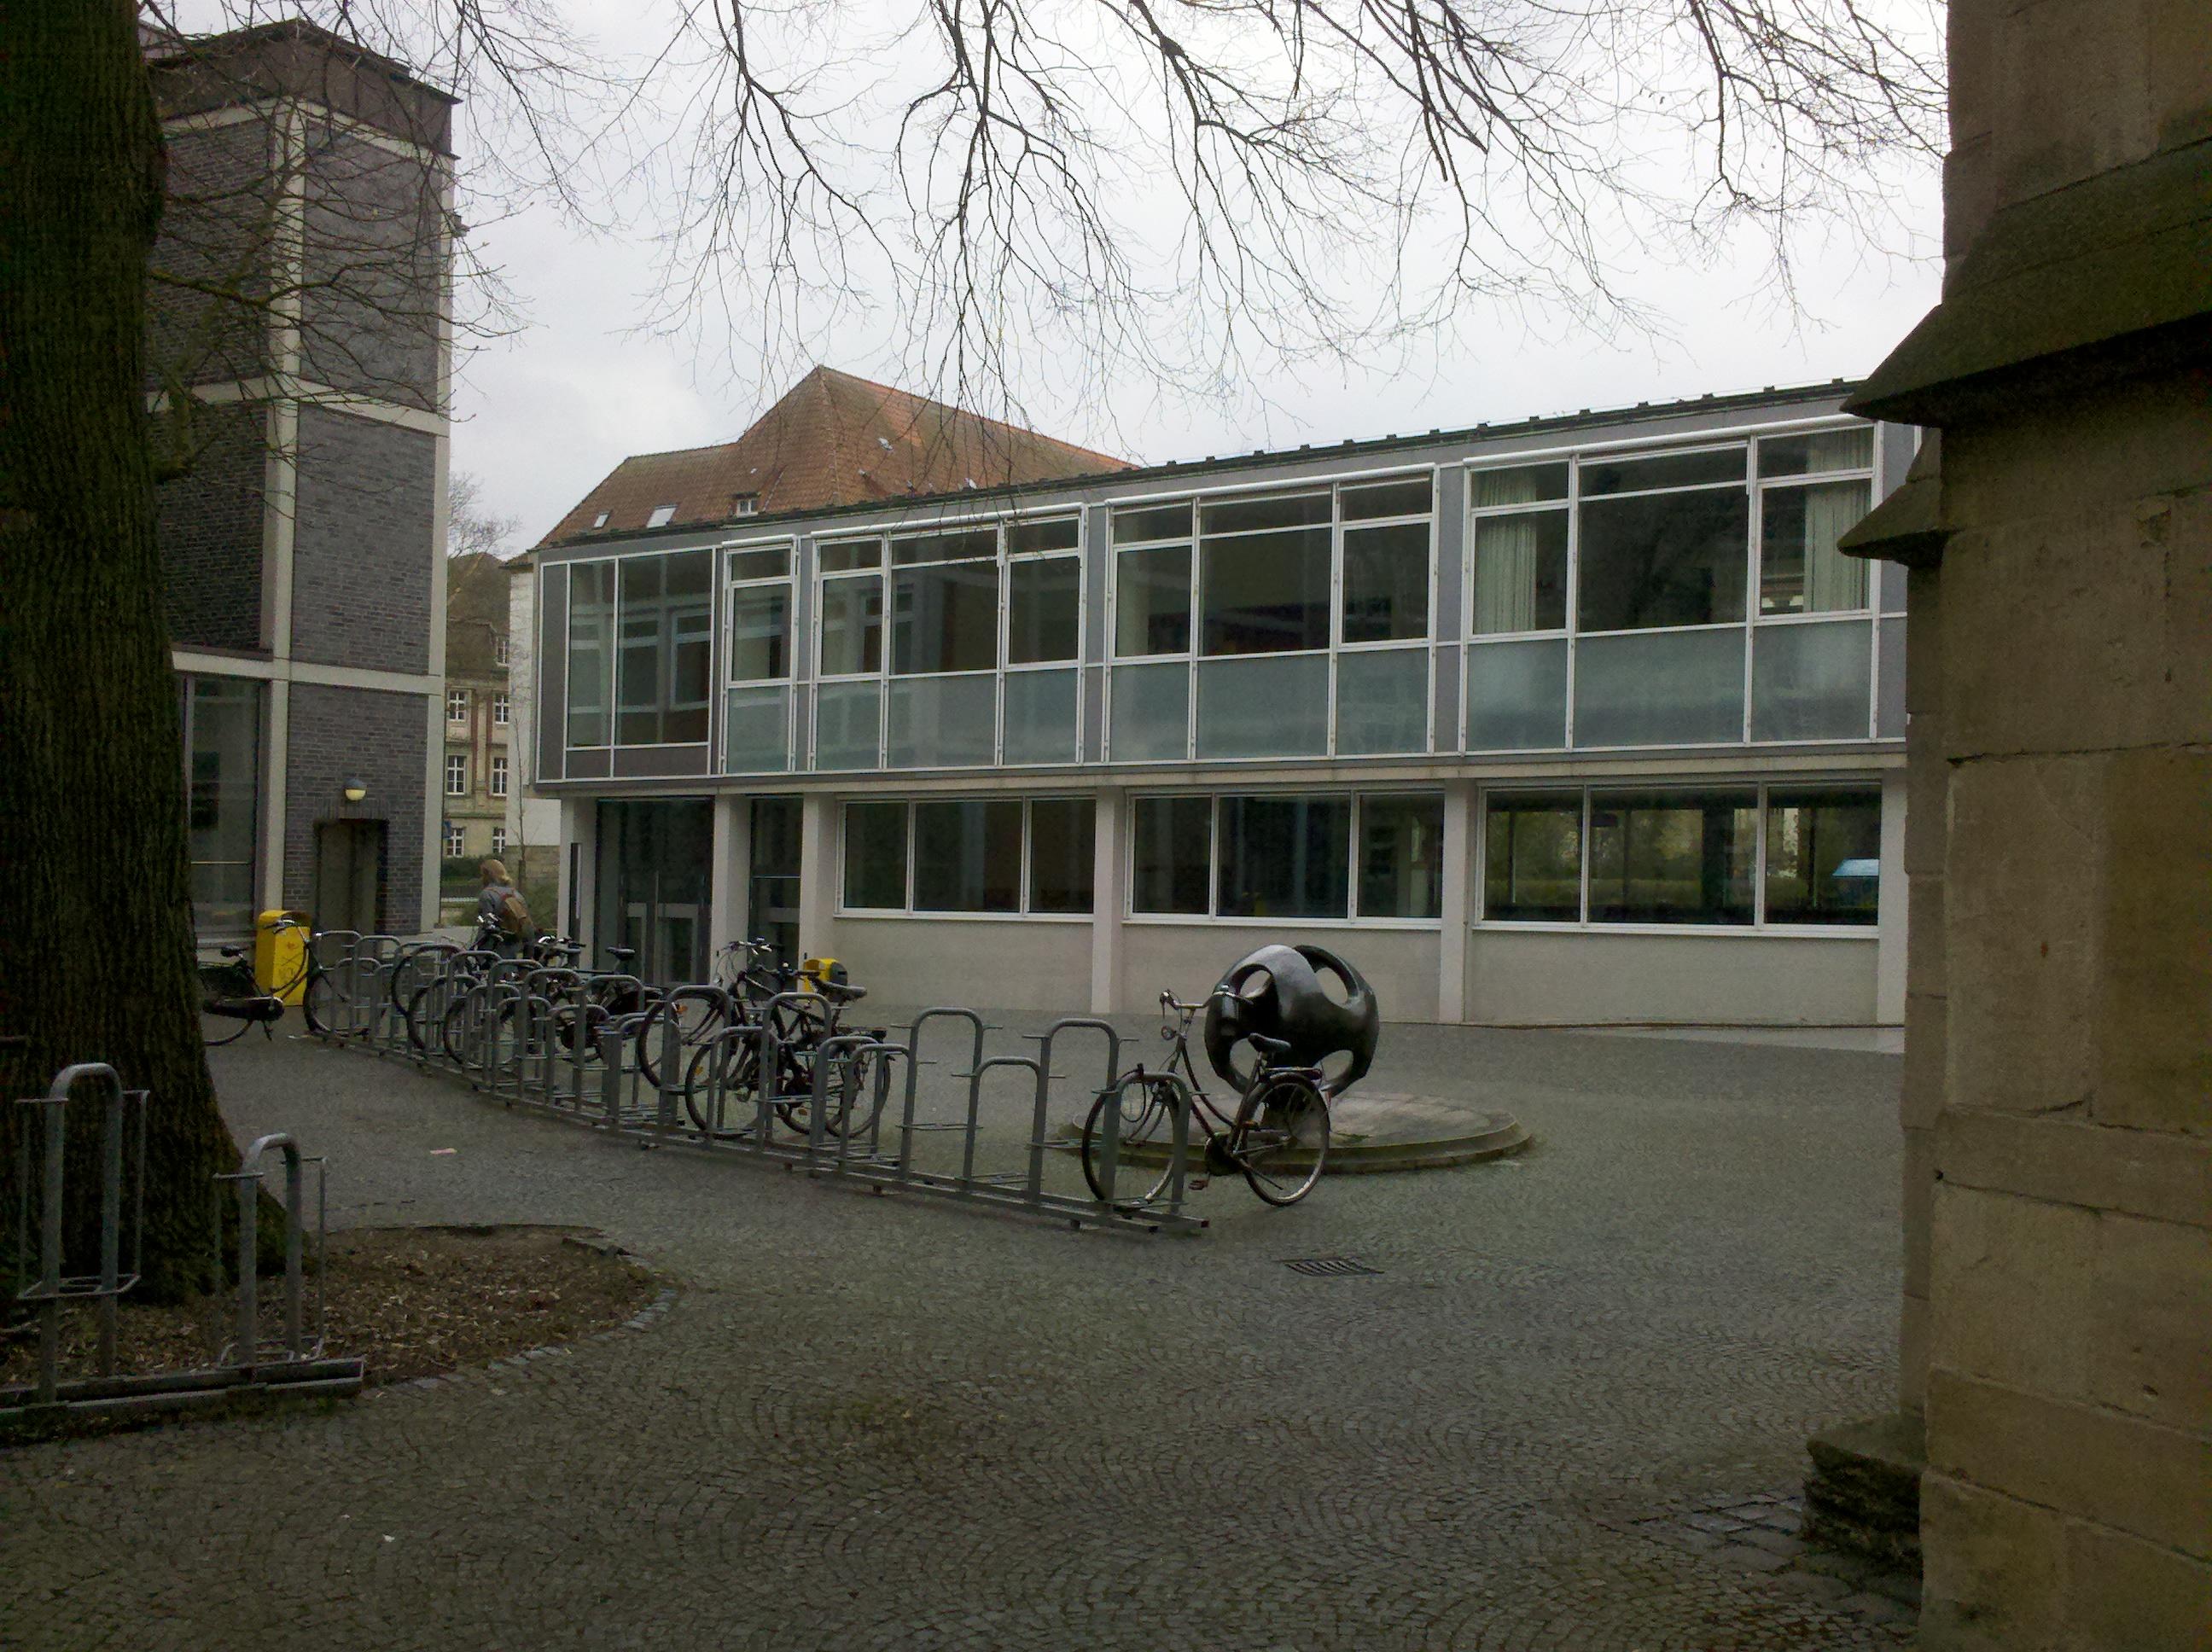 Our workshop venue: Johannisstr. 4